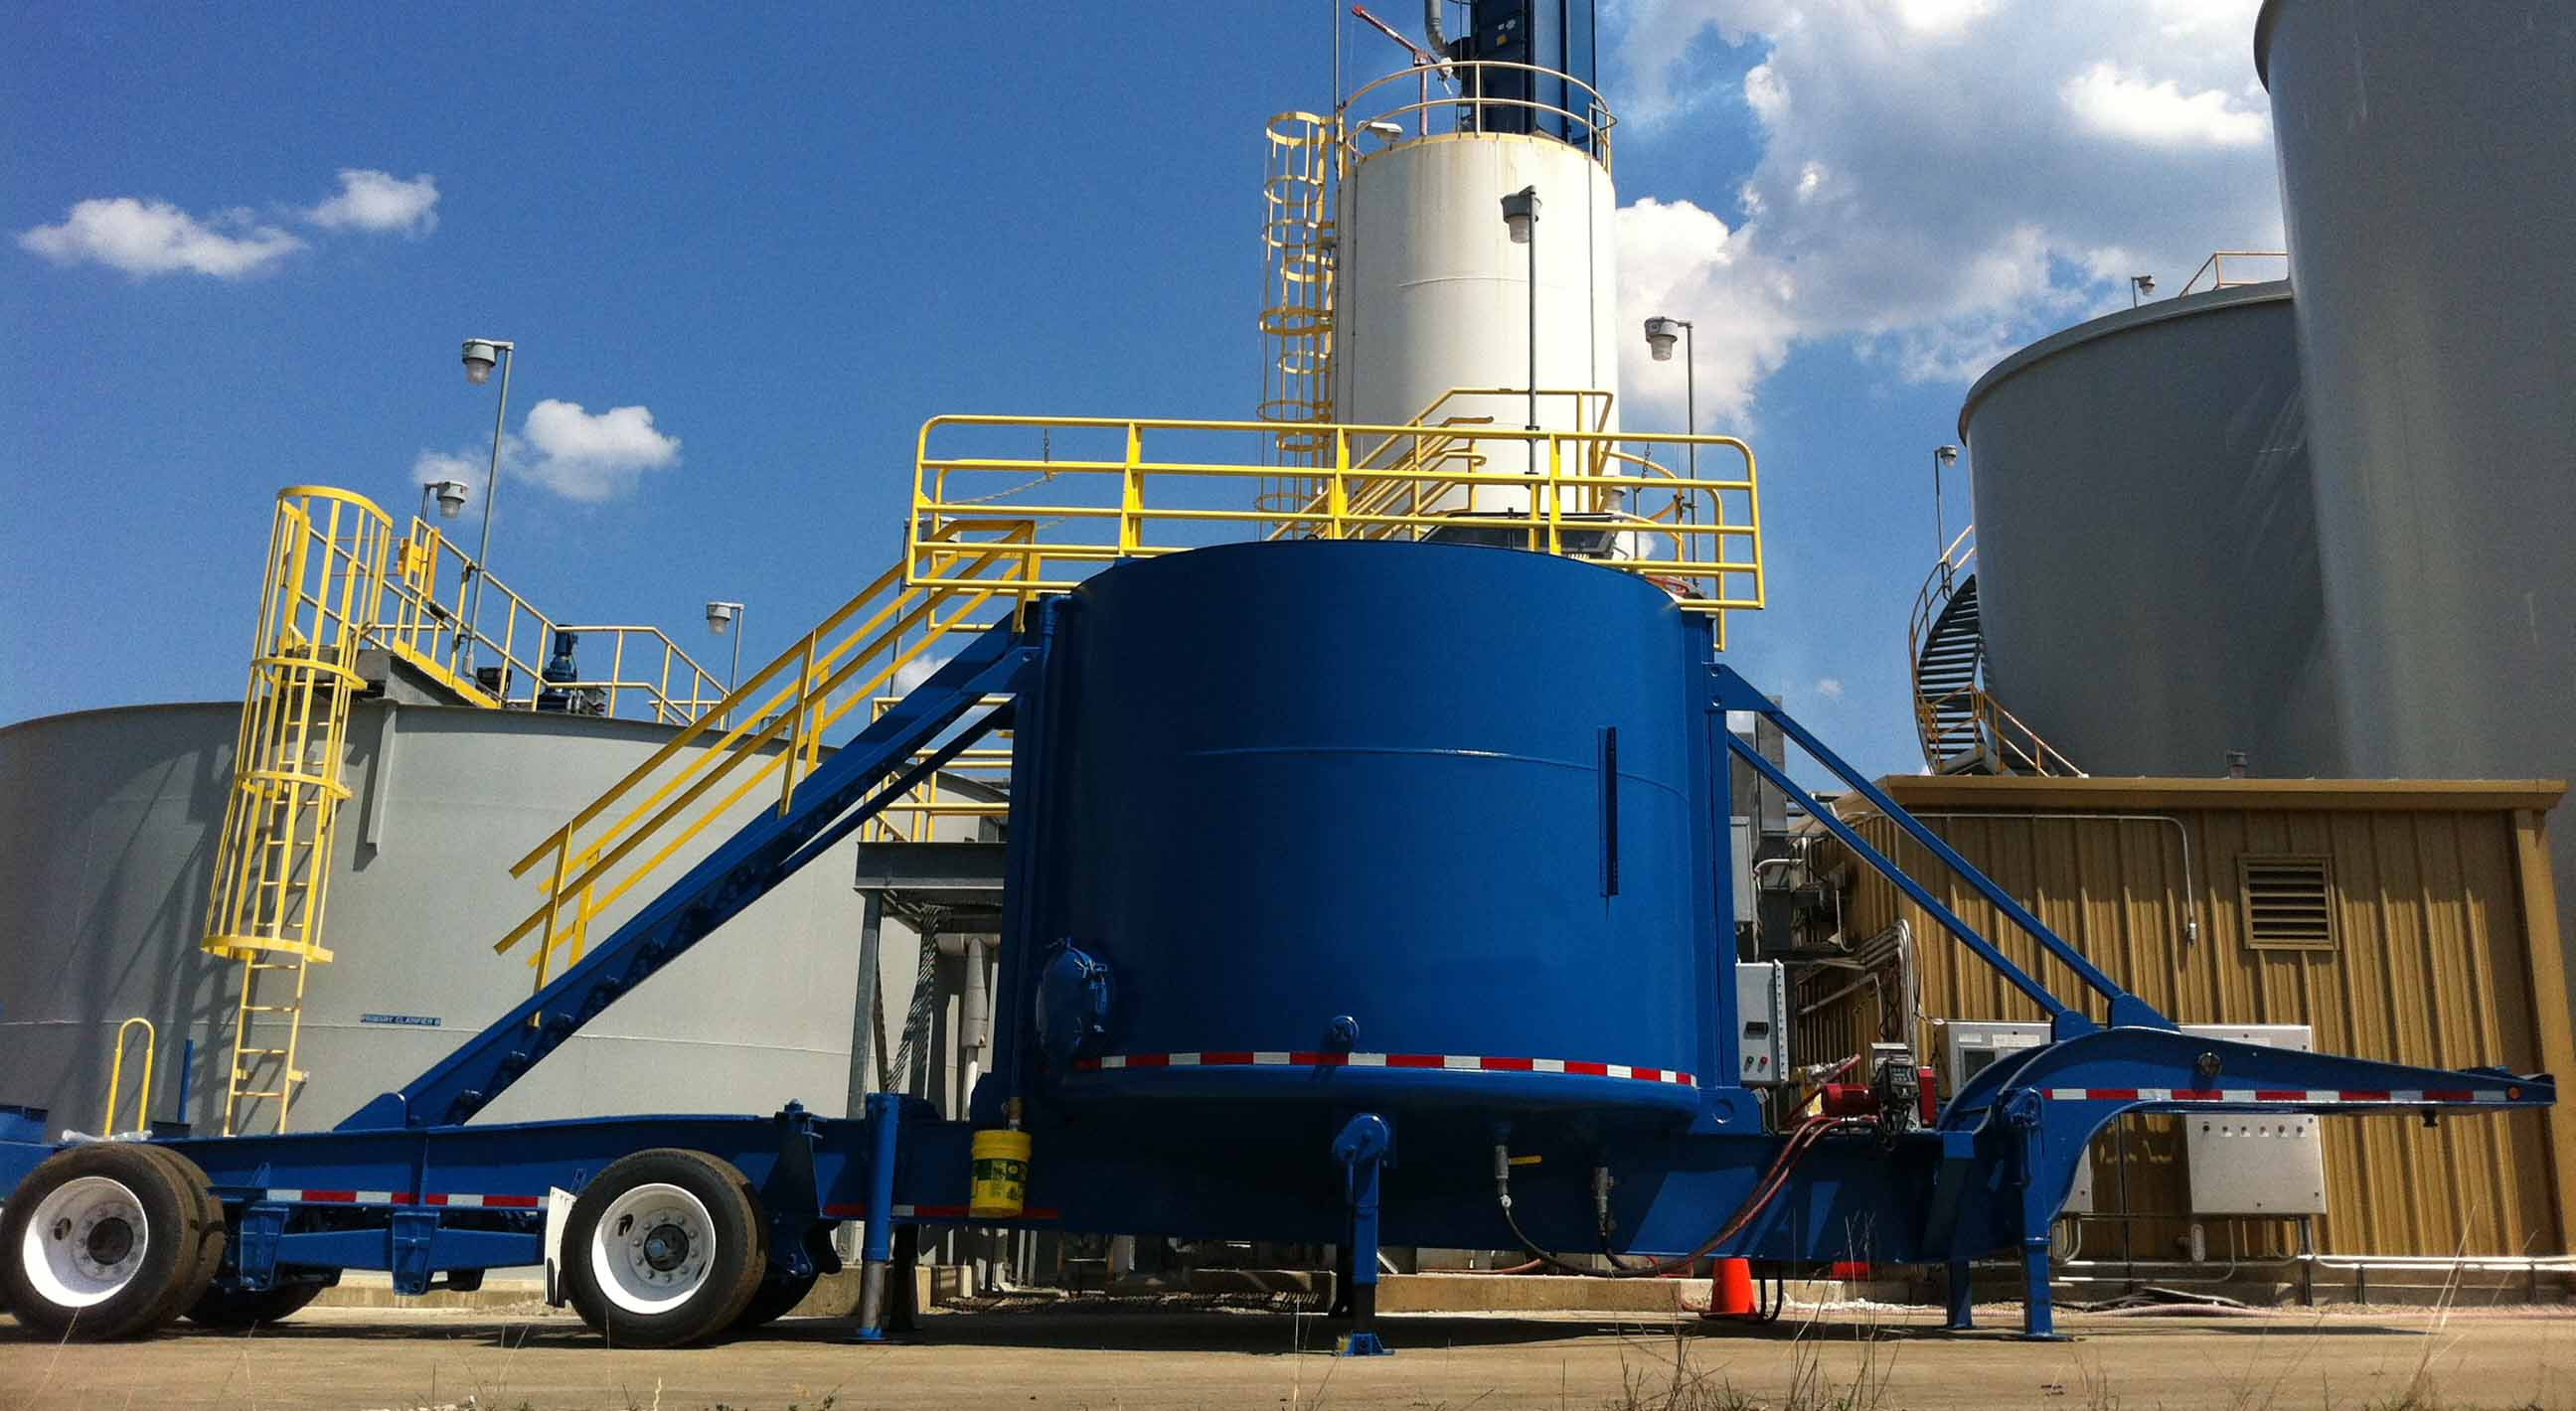 7,600 gallon total capacity, 460V